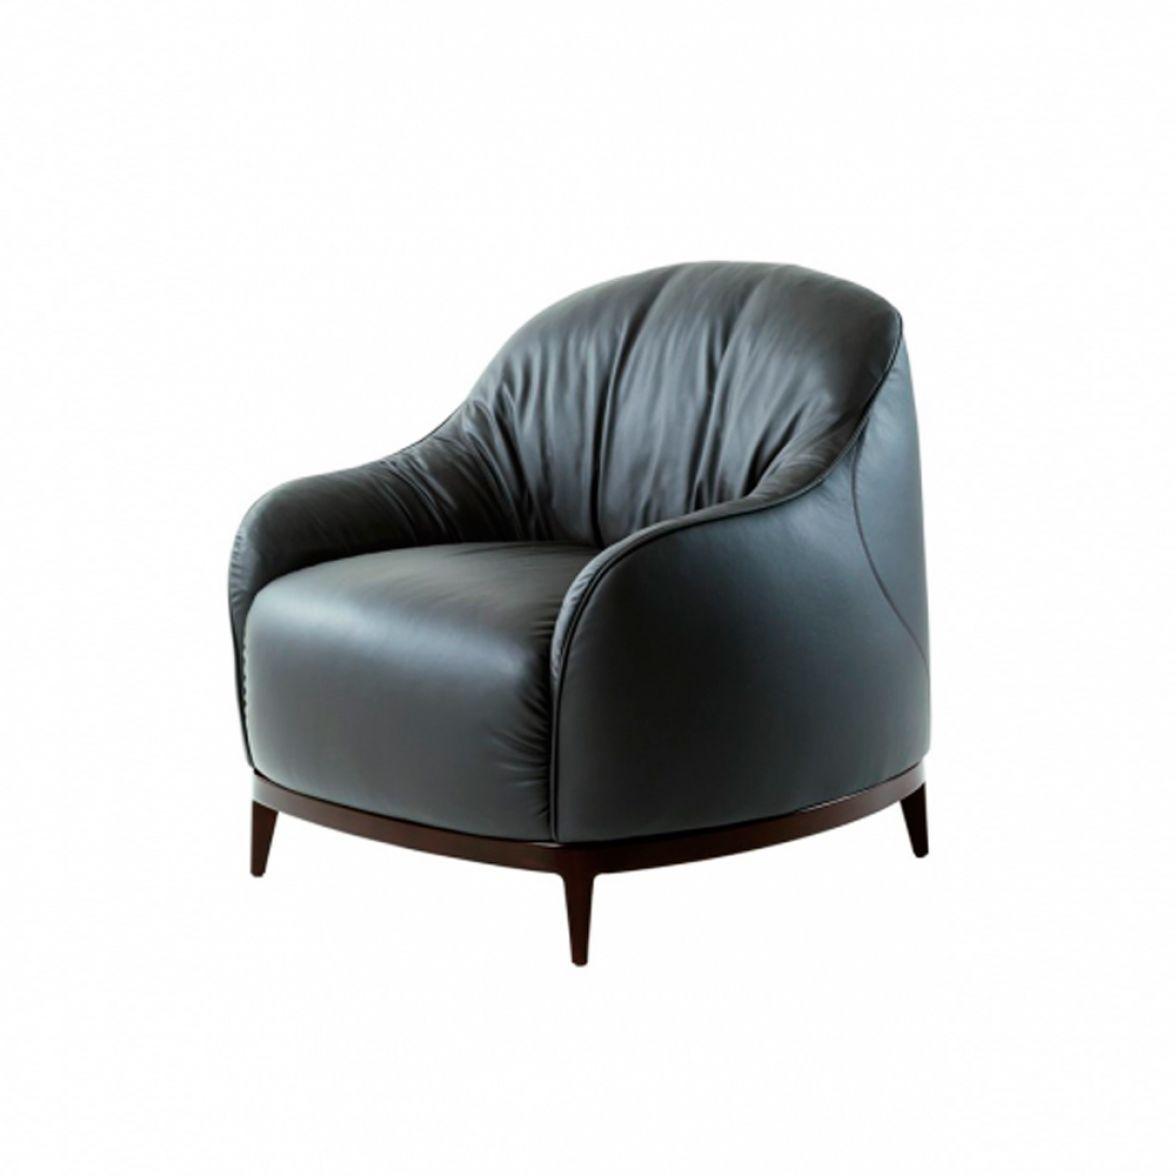 BALI armchair